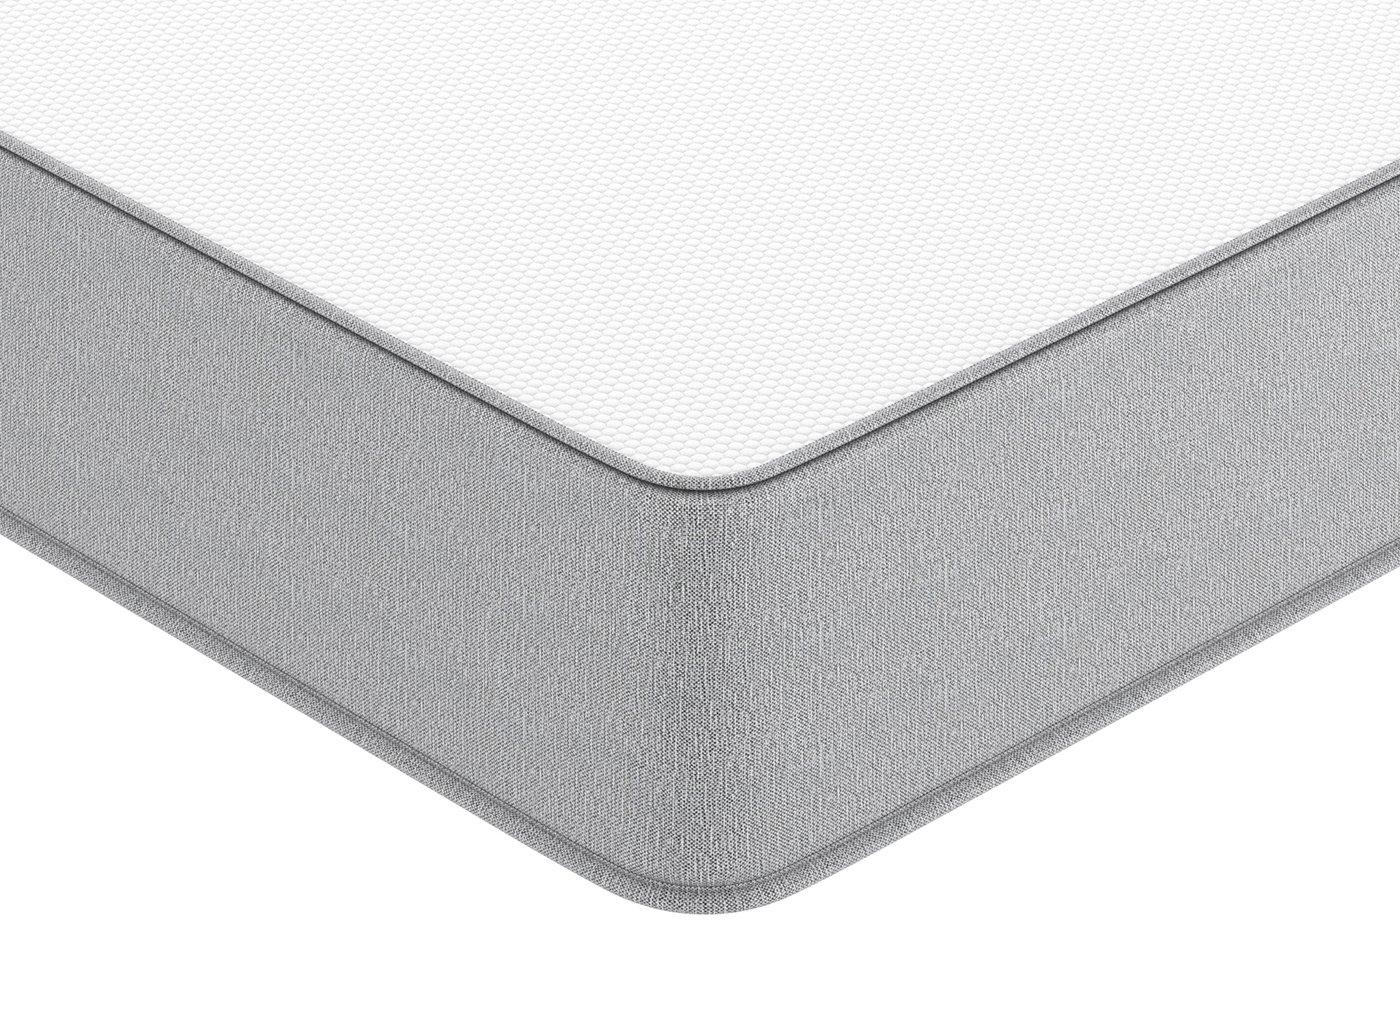 hyde---sleep-graphite-foam-mattress